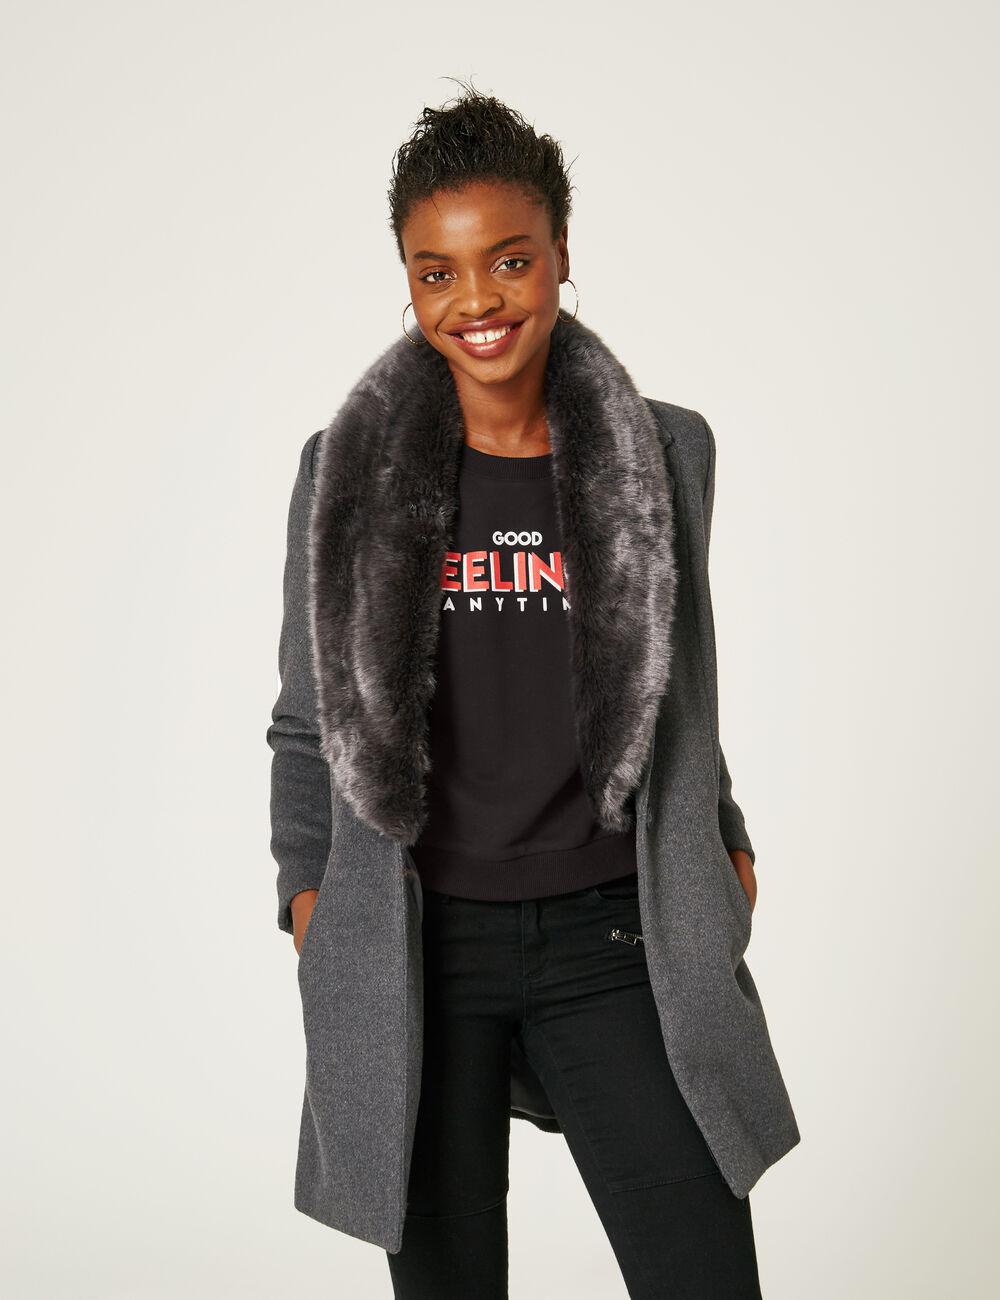 manteau col fausse fourrure gris anthracite chin femme jennyfer. Black Bedroom Furniture Sets. Home Design Ideas